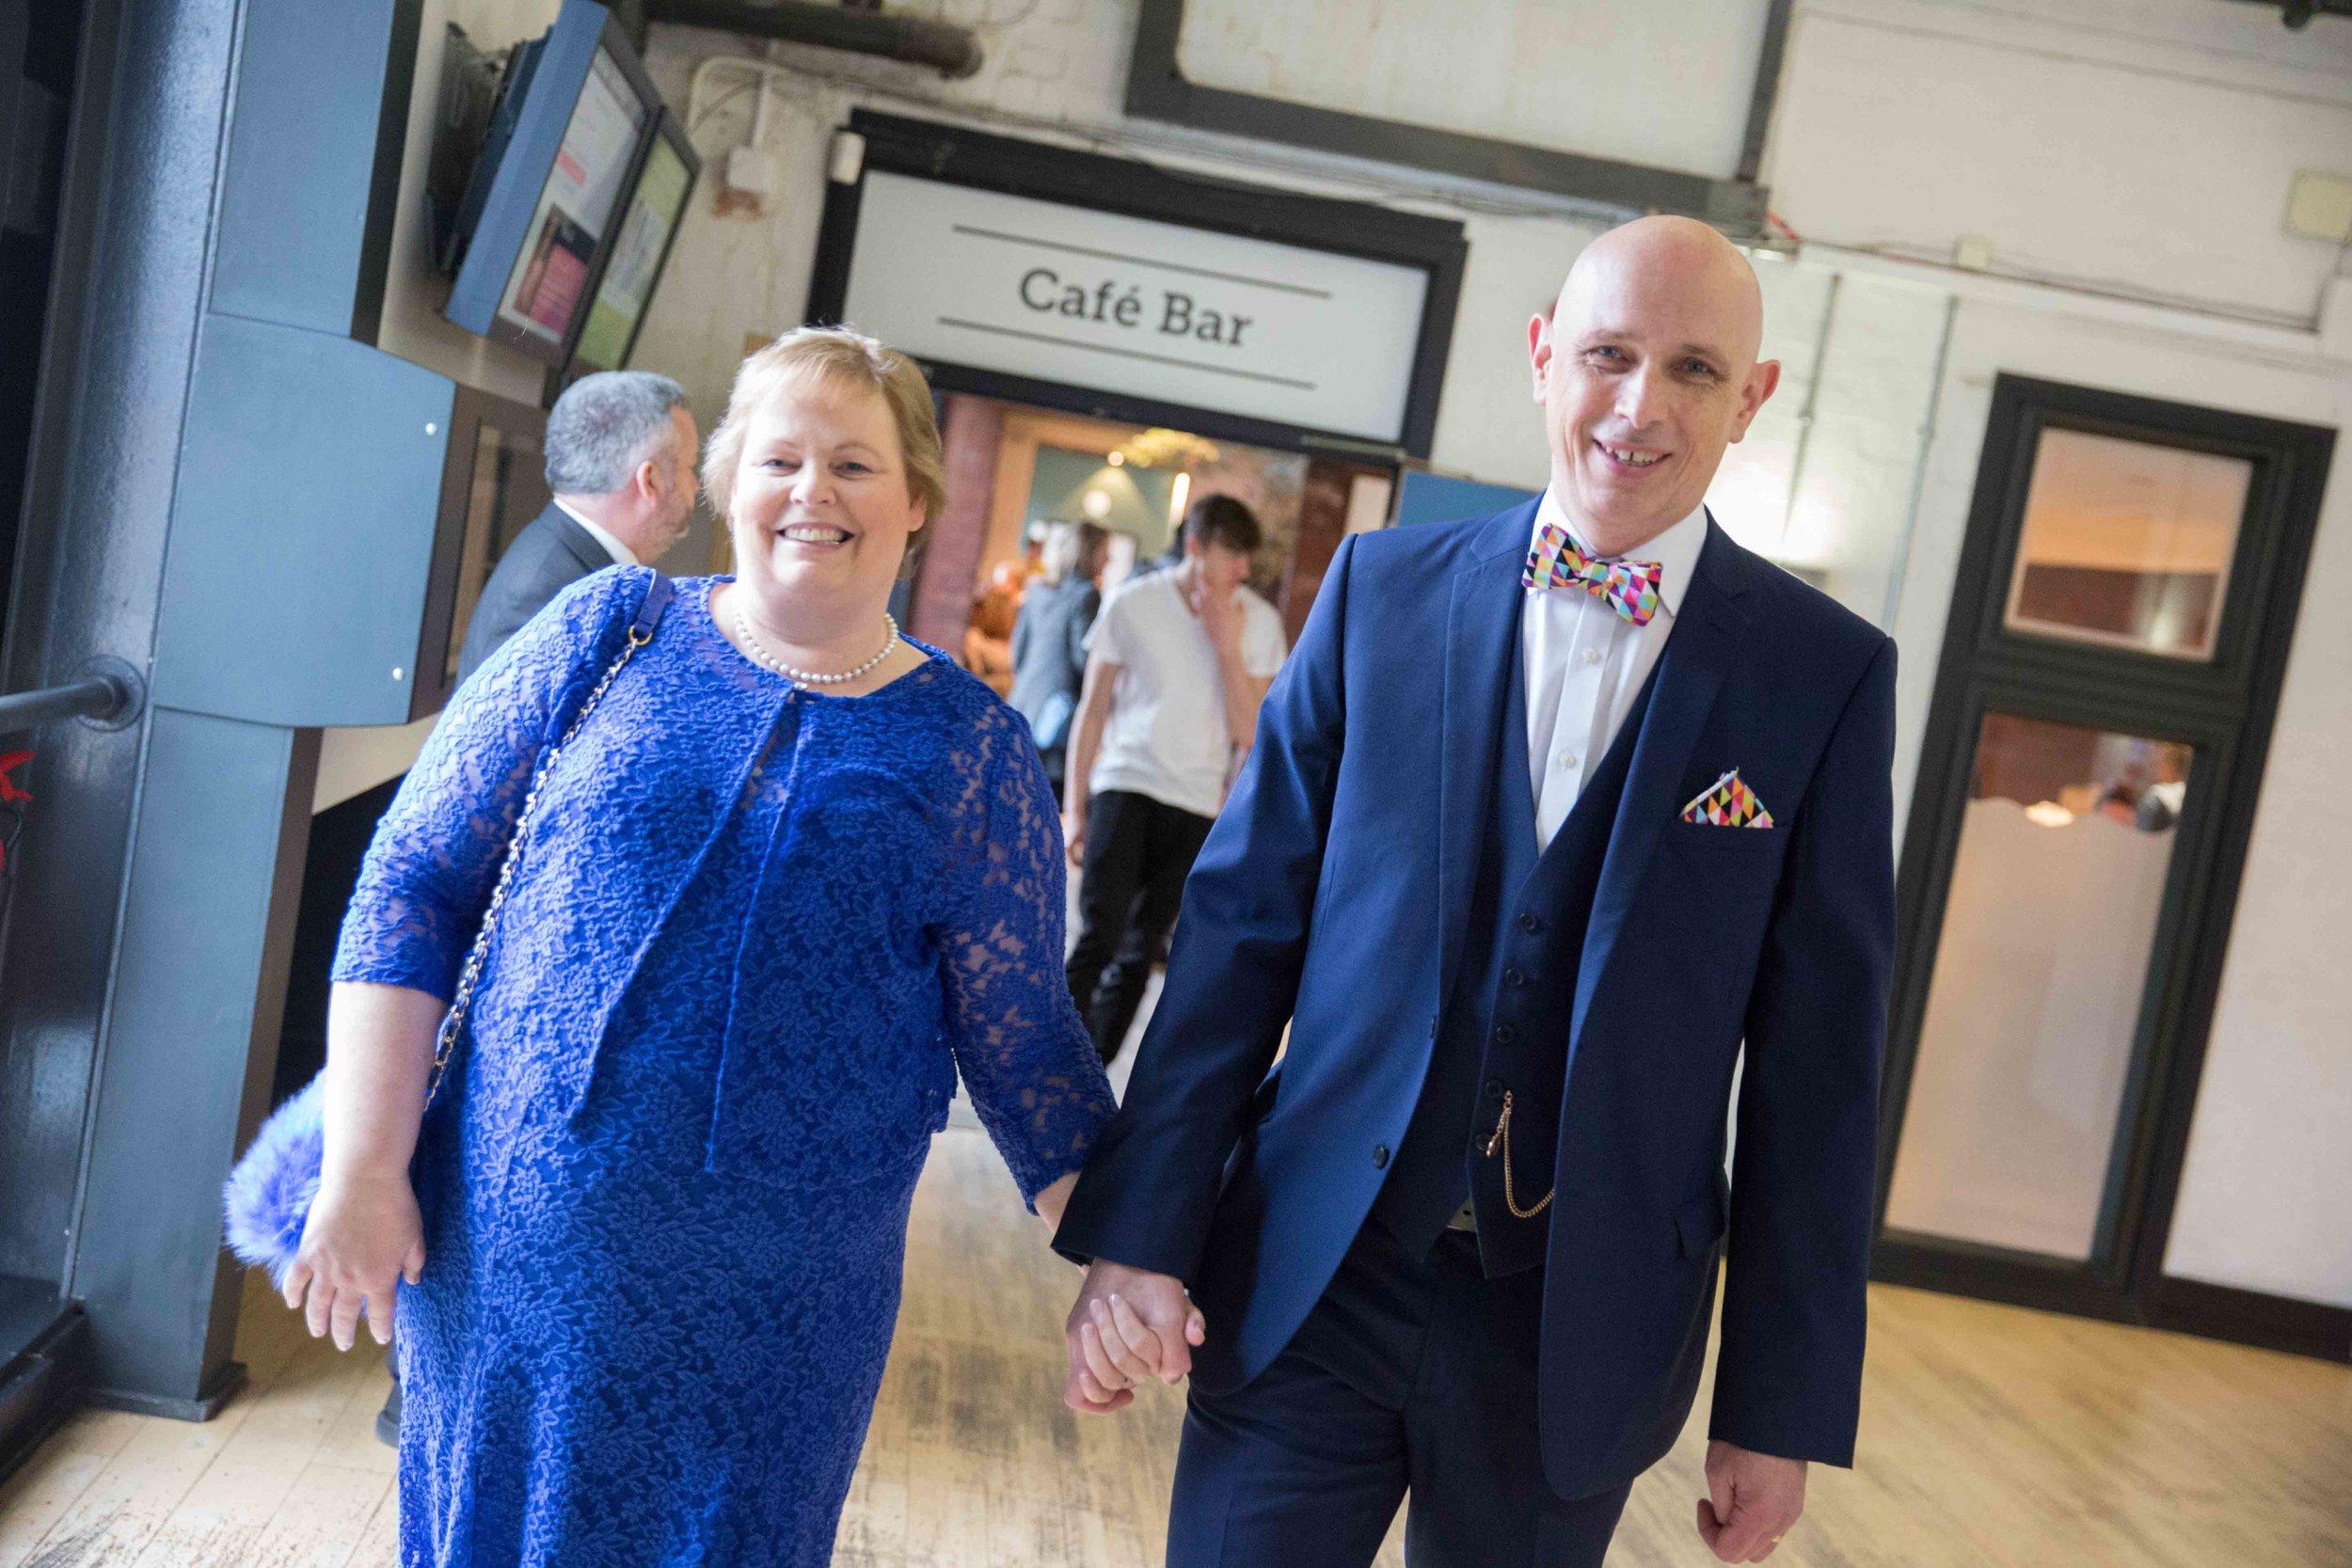 Adam & Faye - Wright Wedding Photography - Bristol Wedding Photographer -27.jpg